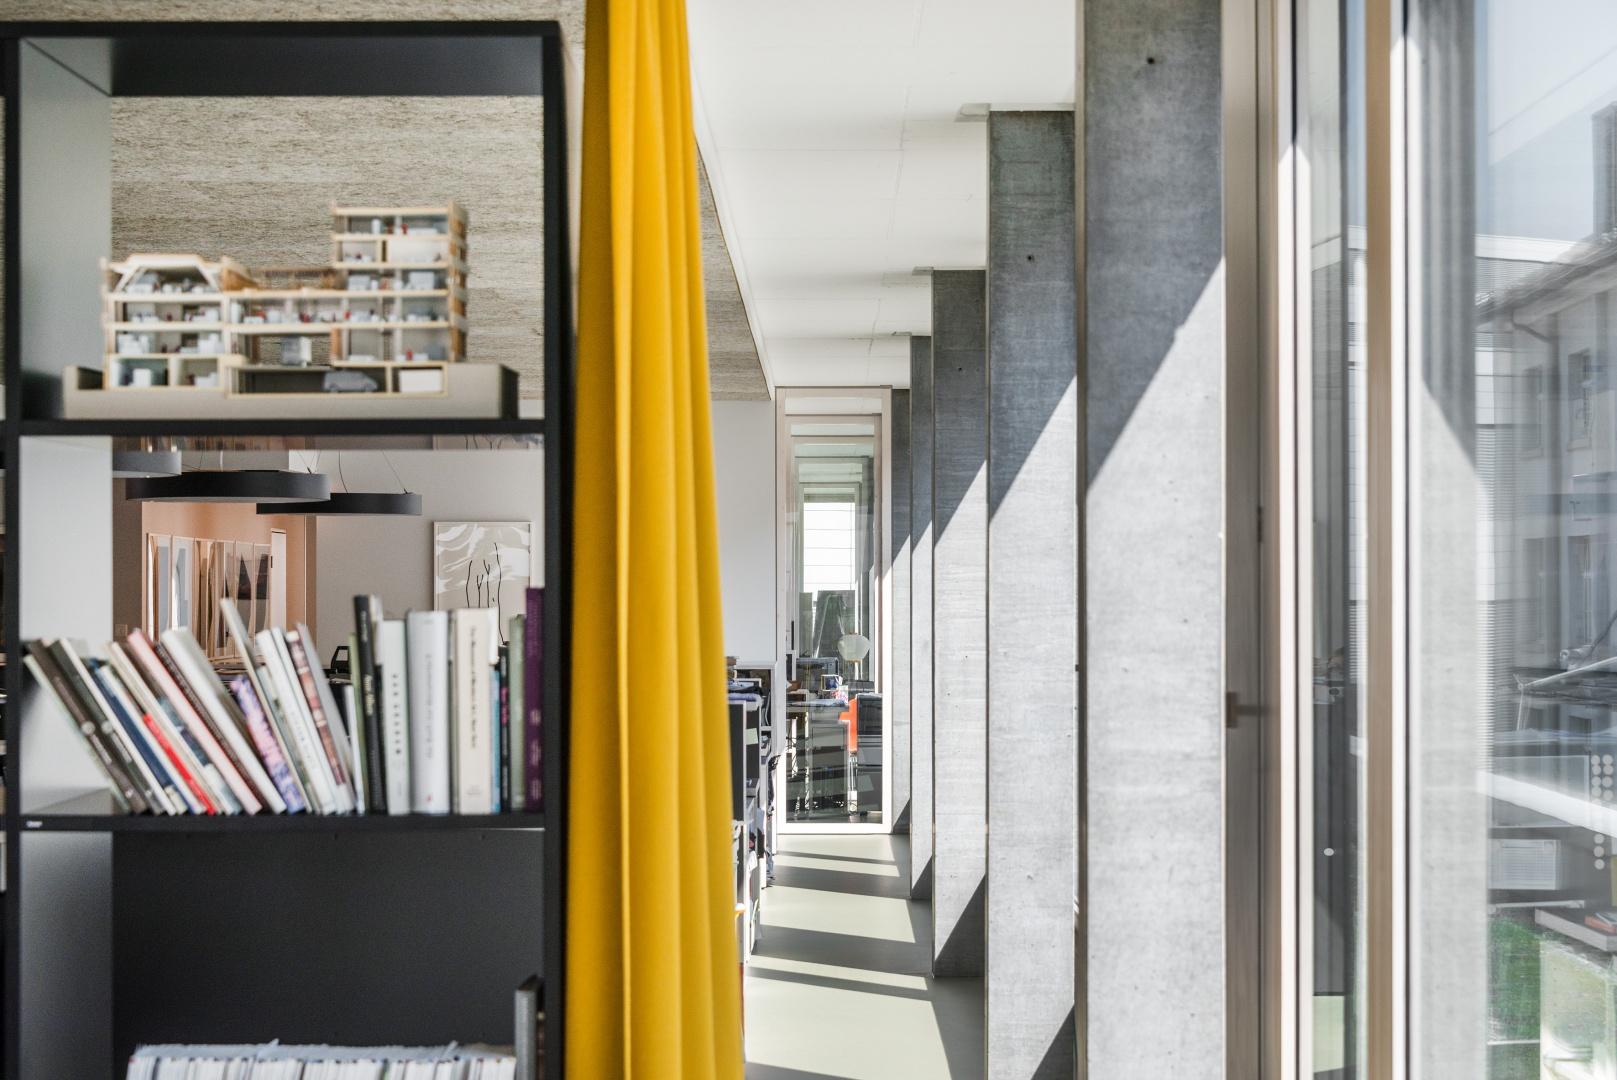 Büro Perspektive © Johannes Marburg, Genf